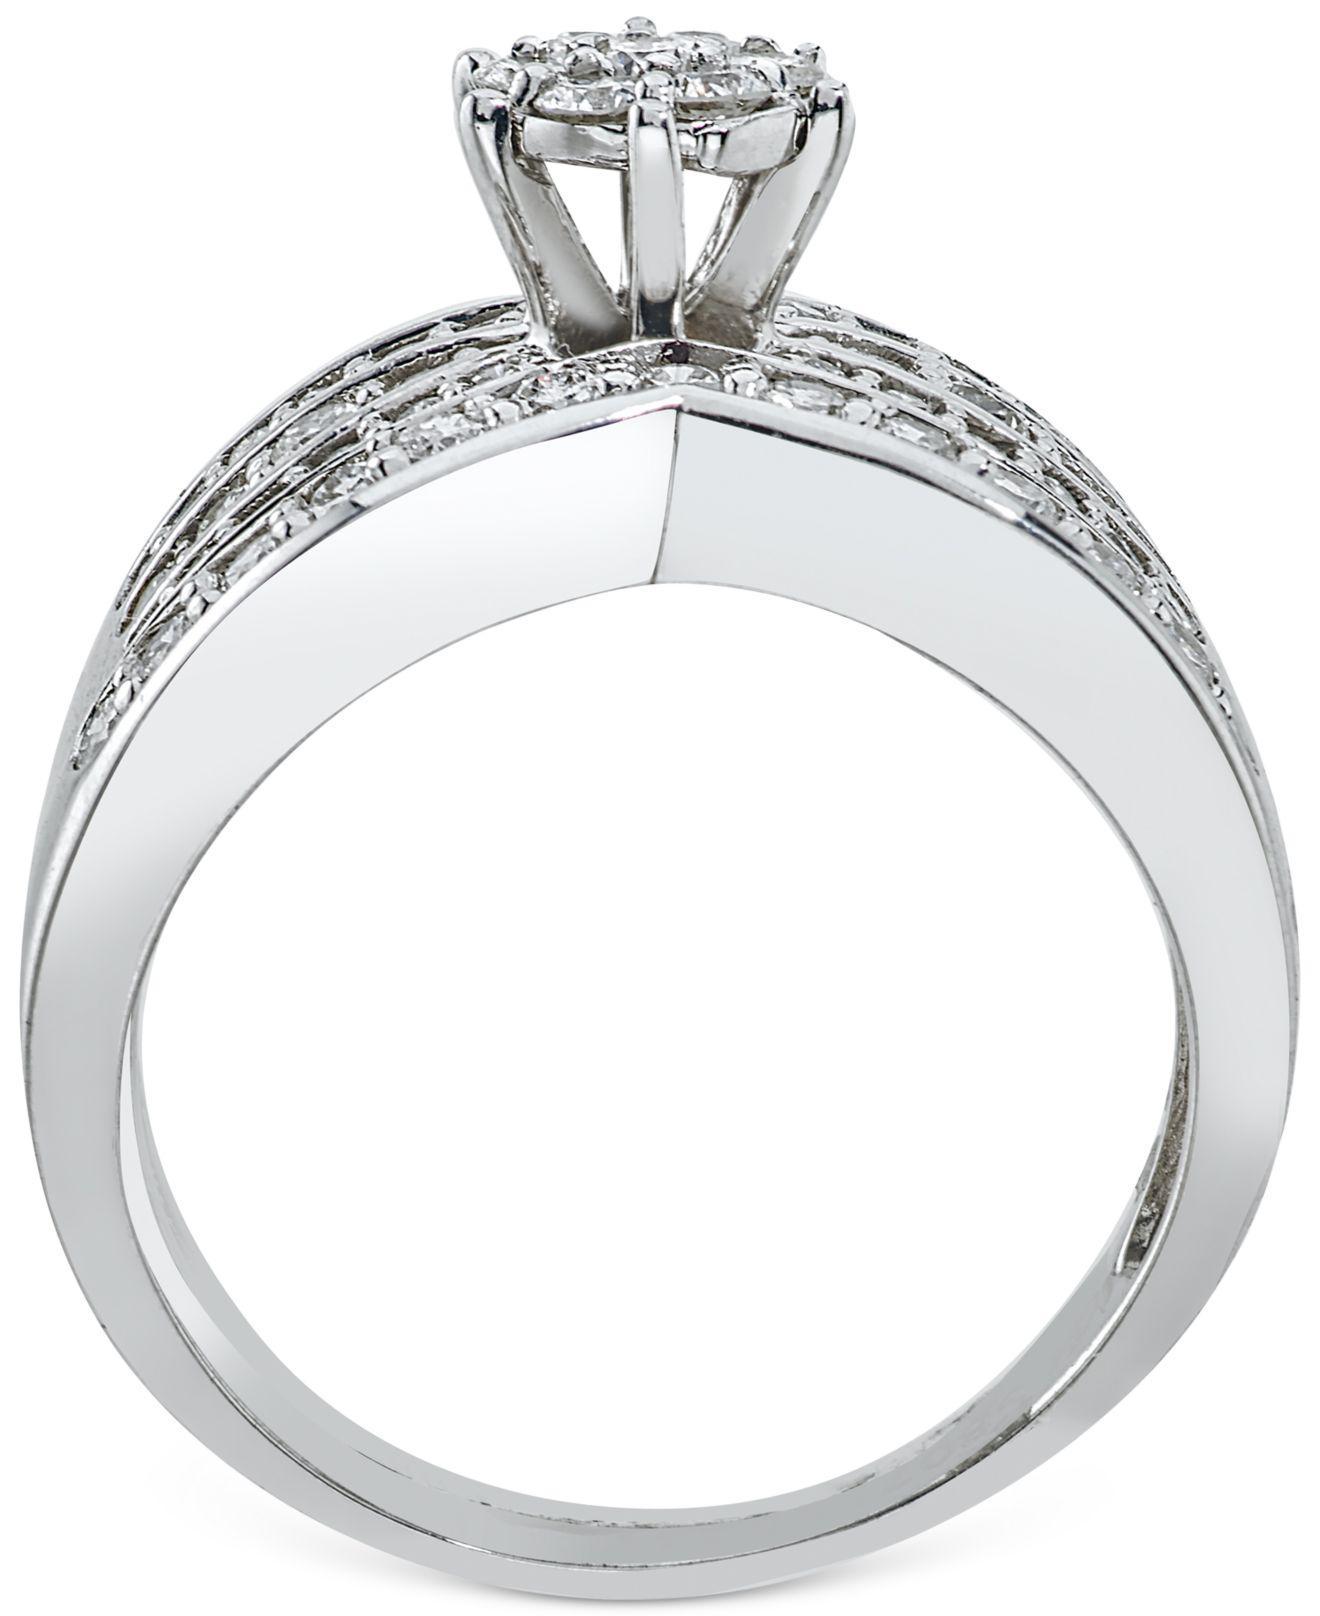 Macy s Diamond Bridal Set 7 8 Ct T w In 14k White Gold